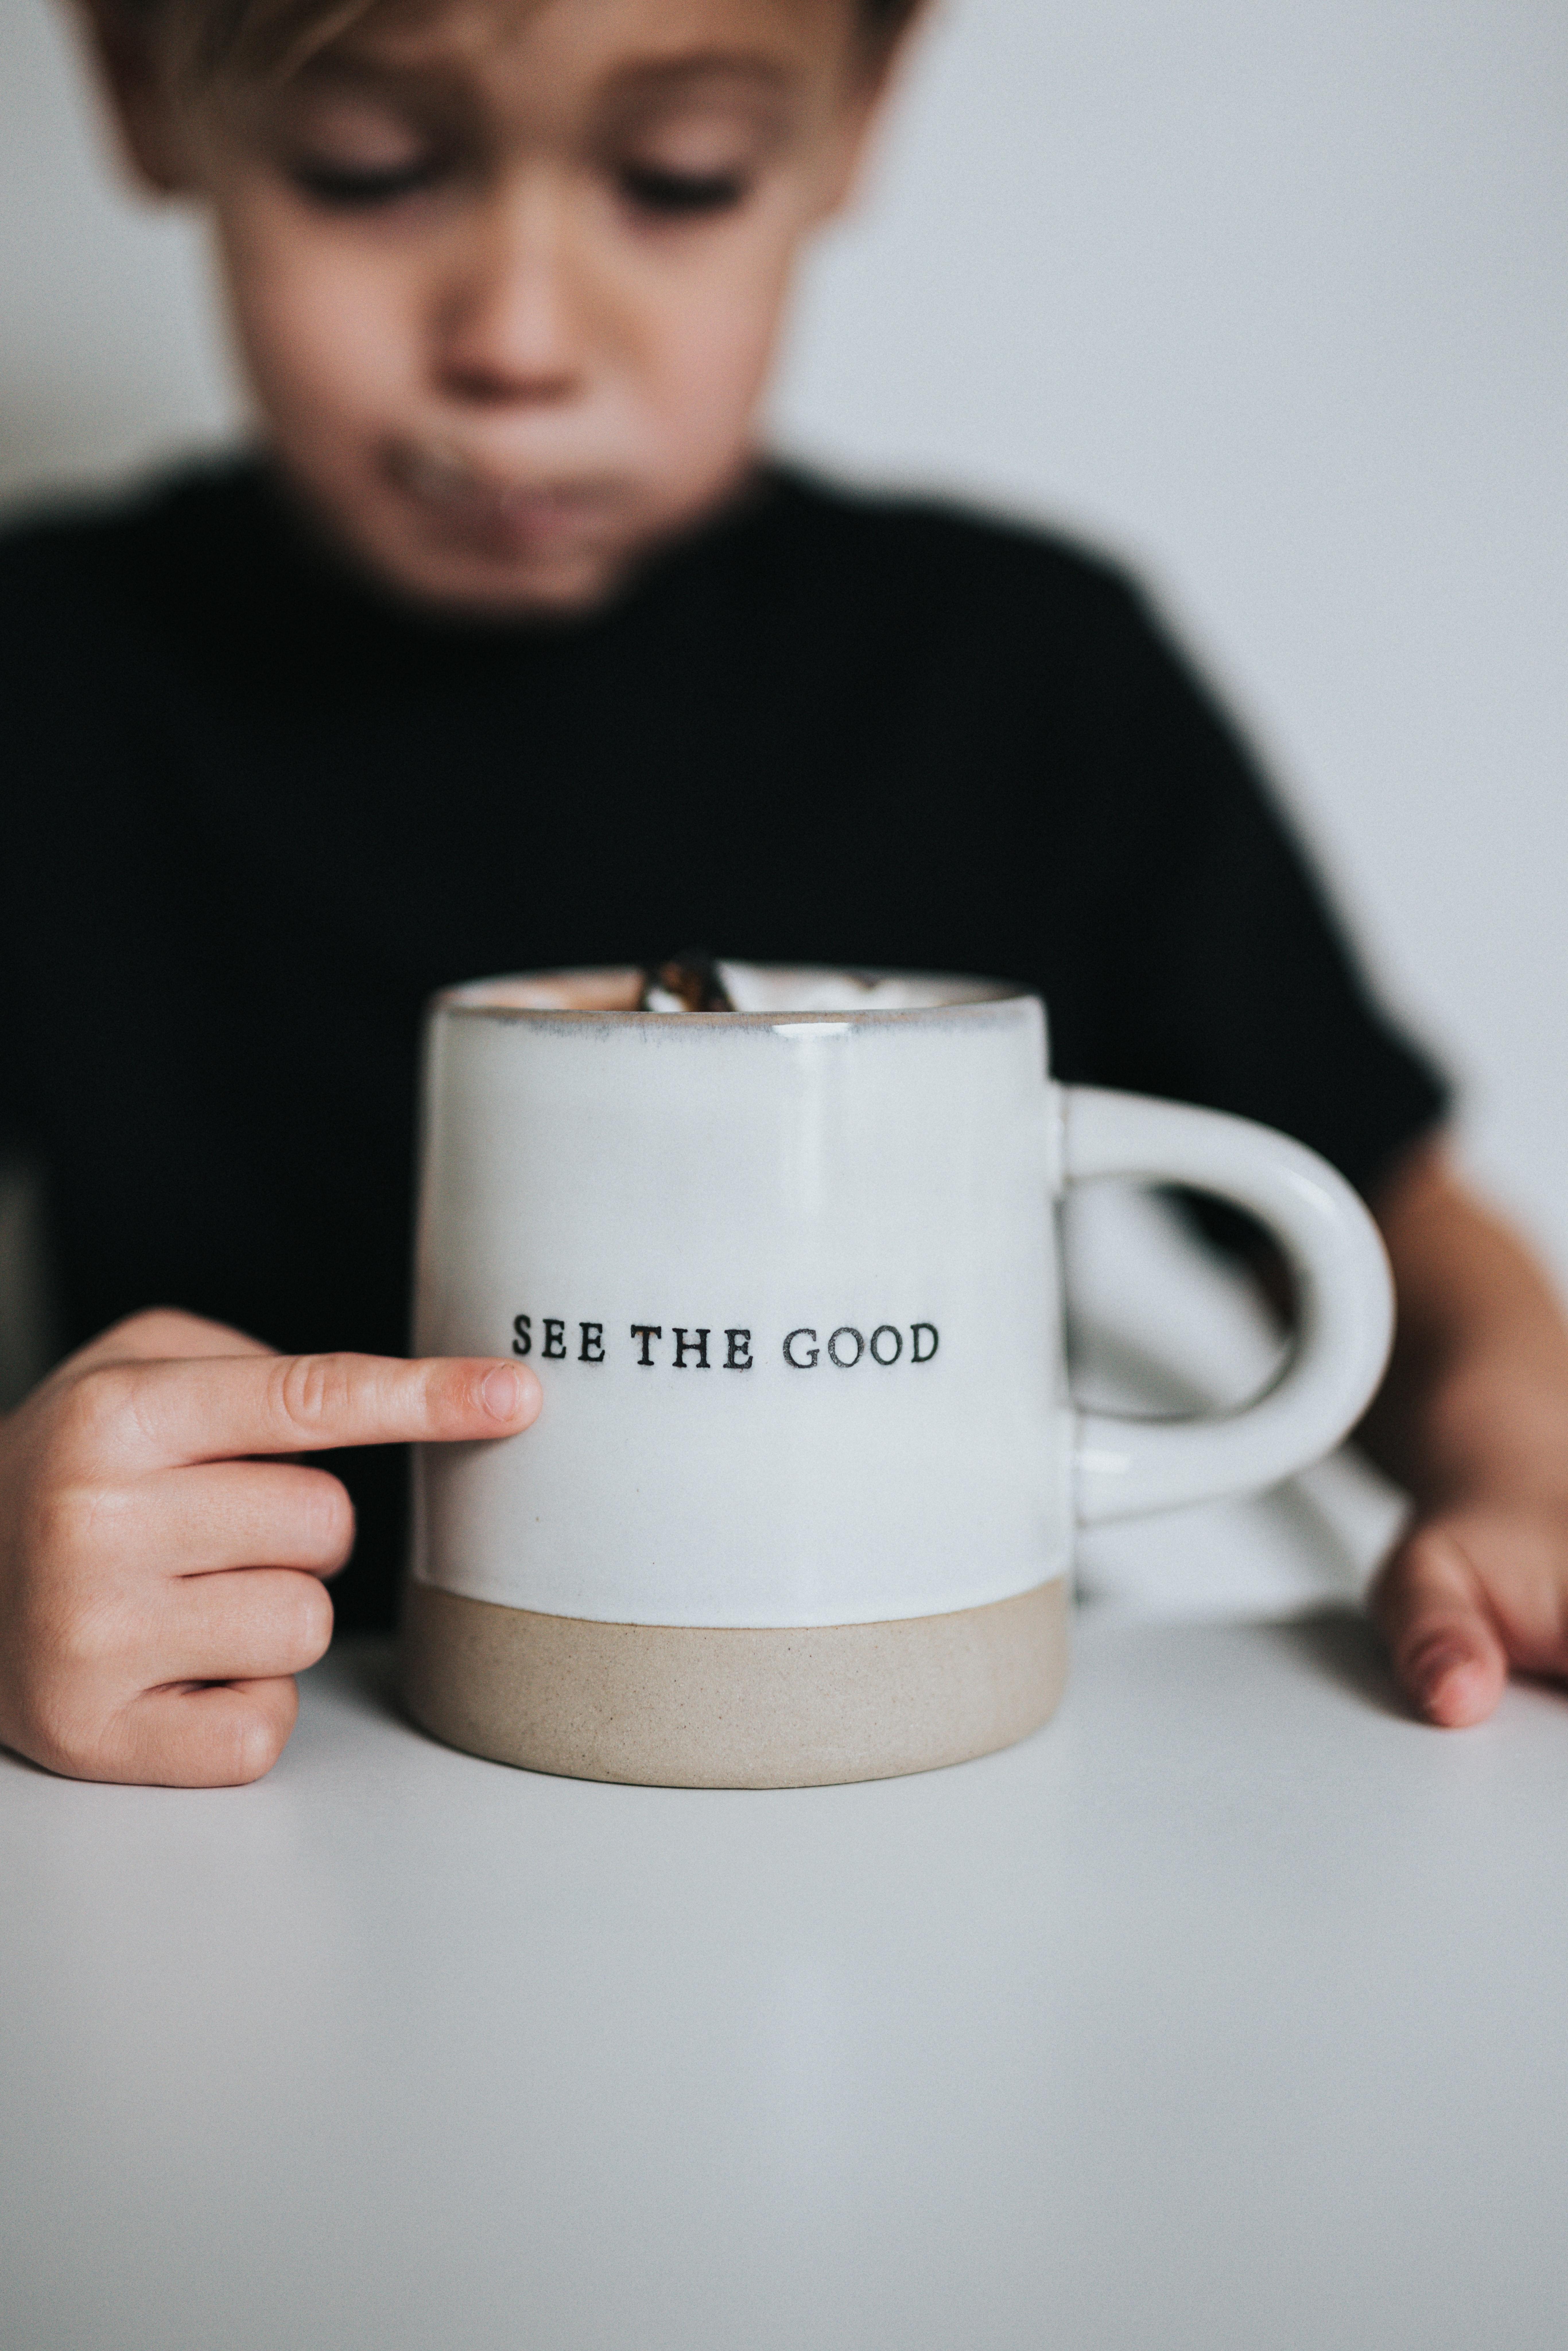 Optimism with a Sense of Gratitude